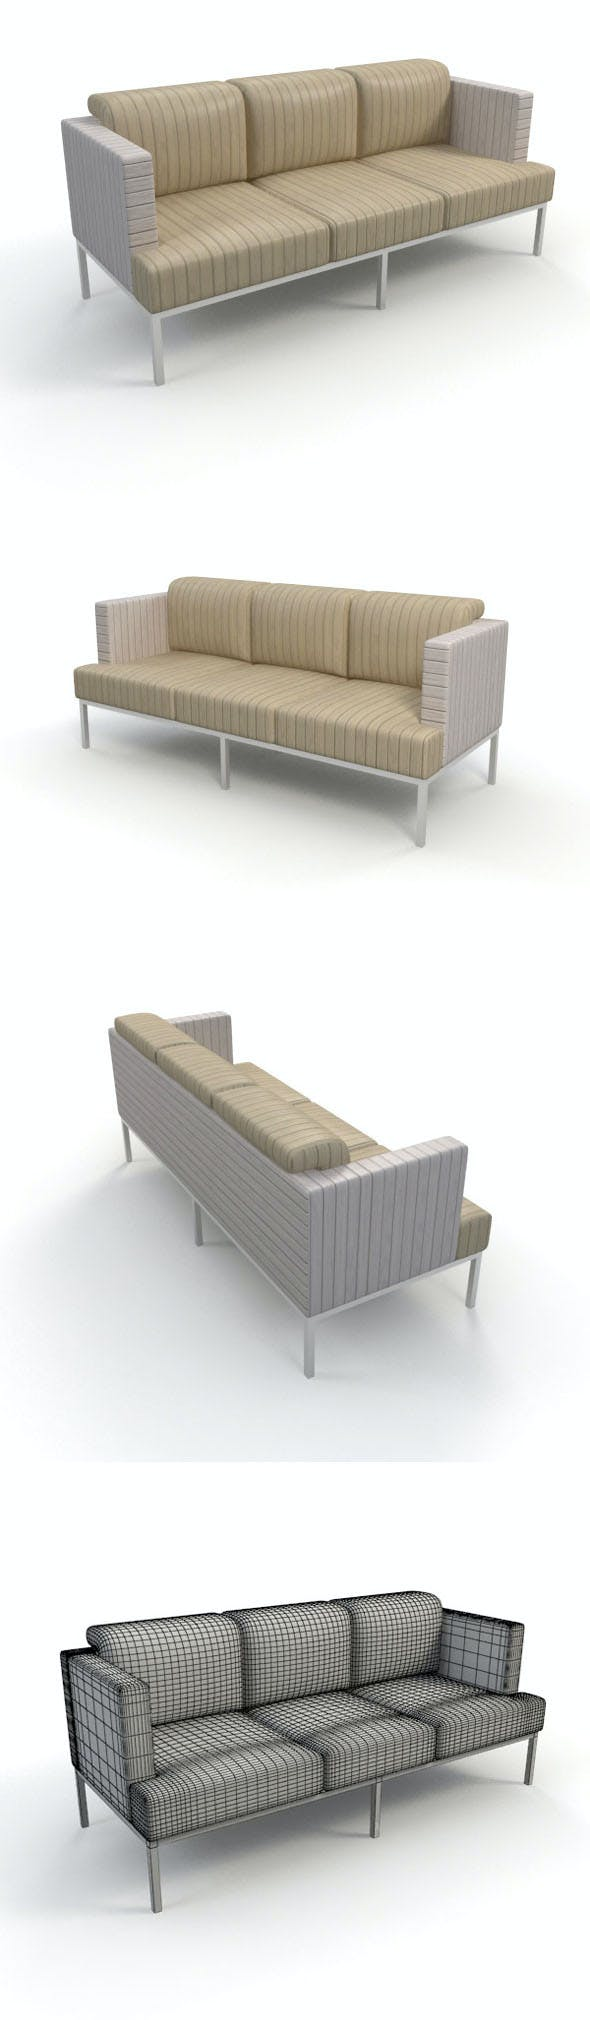 Sofa_13 - 3DOcean Item for Sale